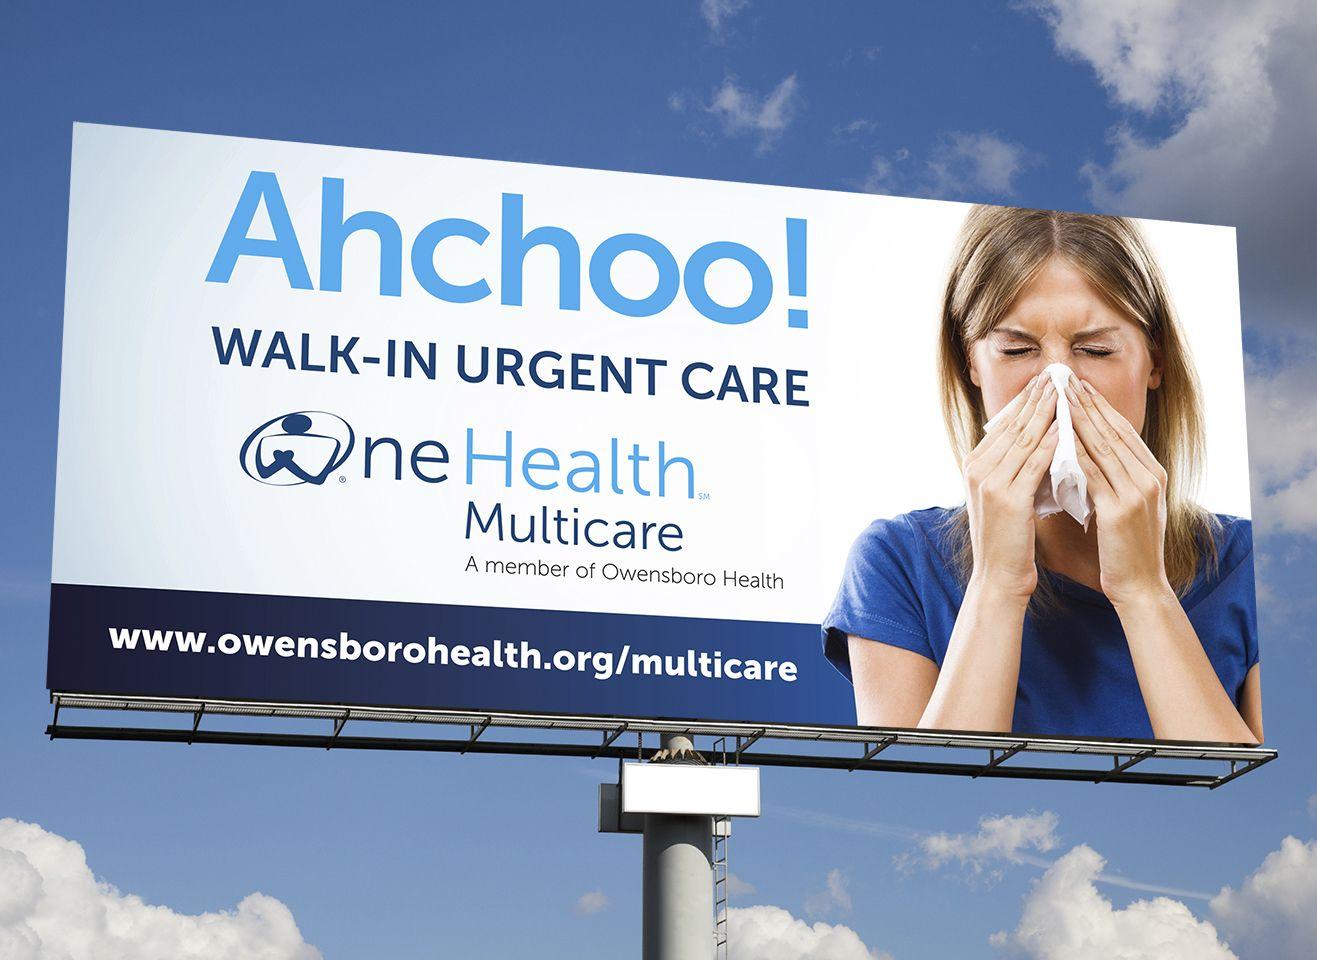 Pin by Madison Strobel on Billboard Design Healthcare